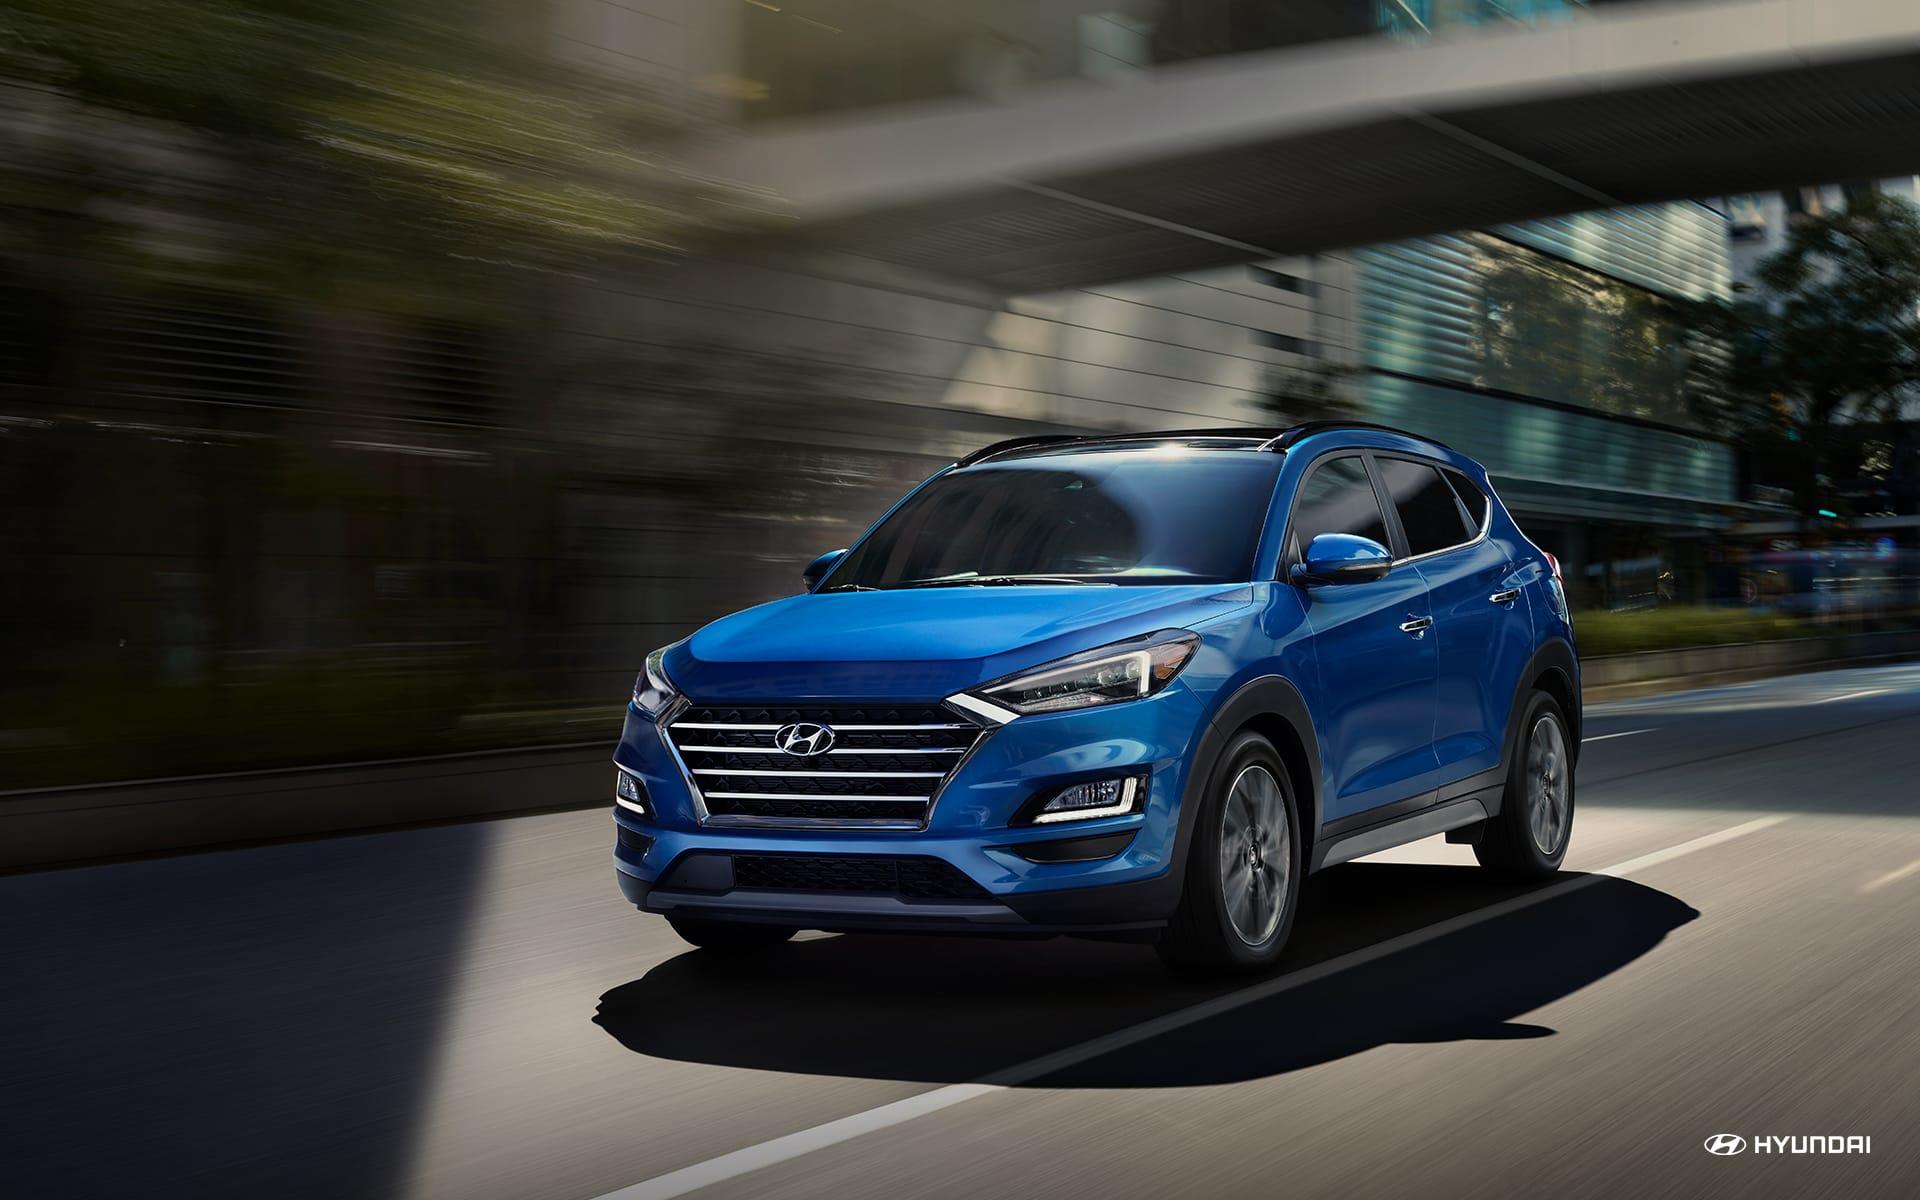 2020 Hyundai Tucson Leasing near Washington, DC